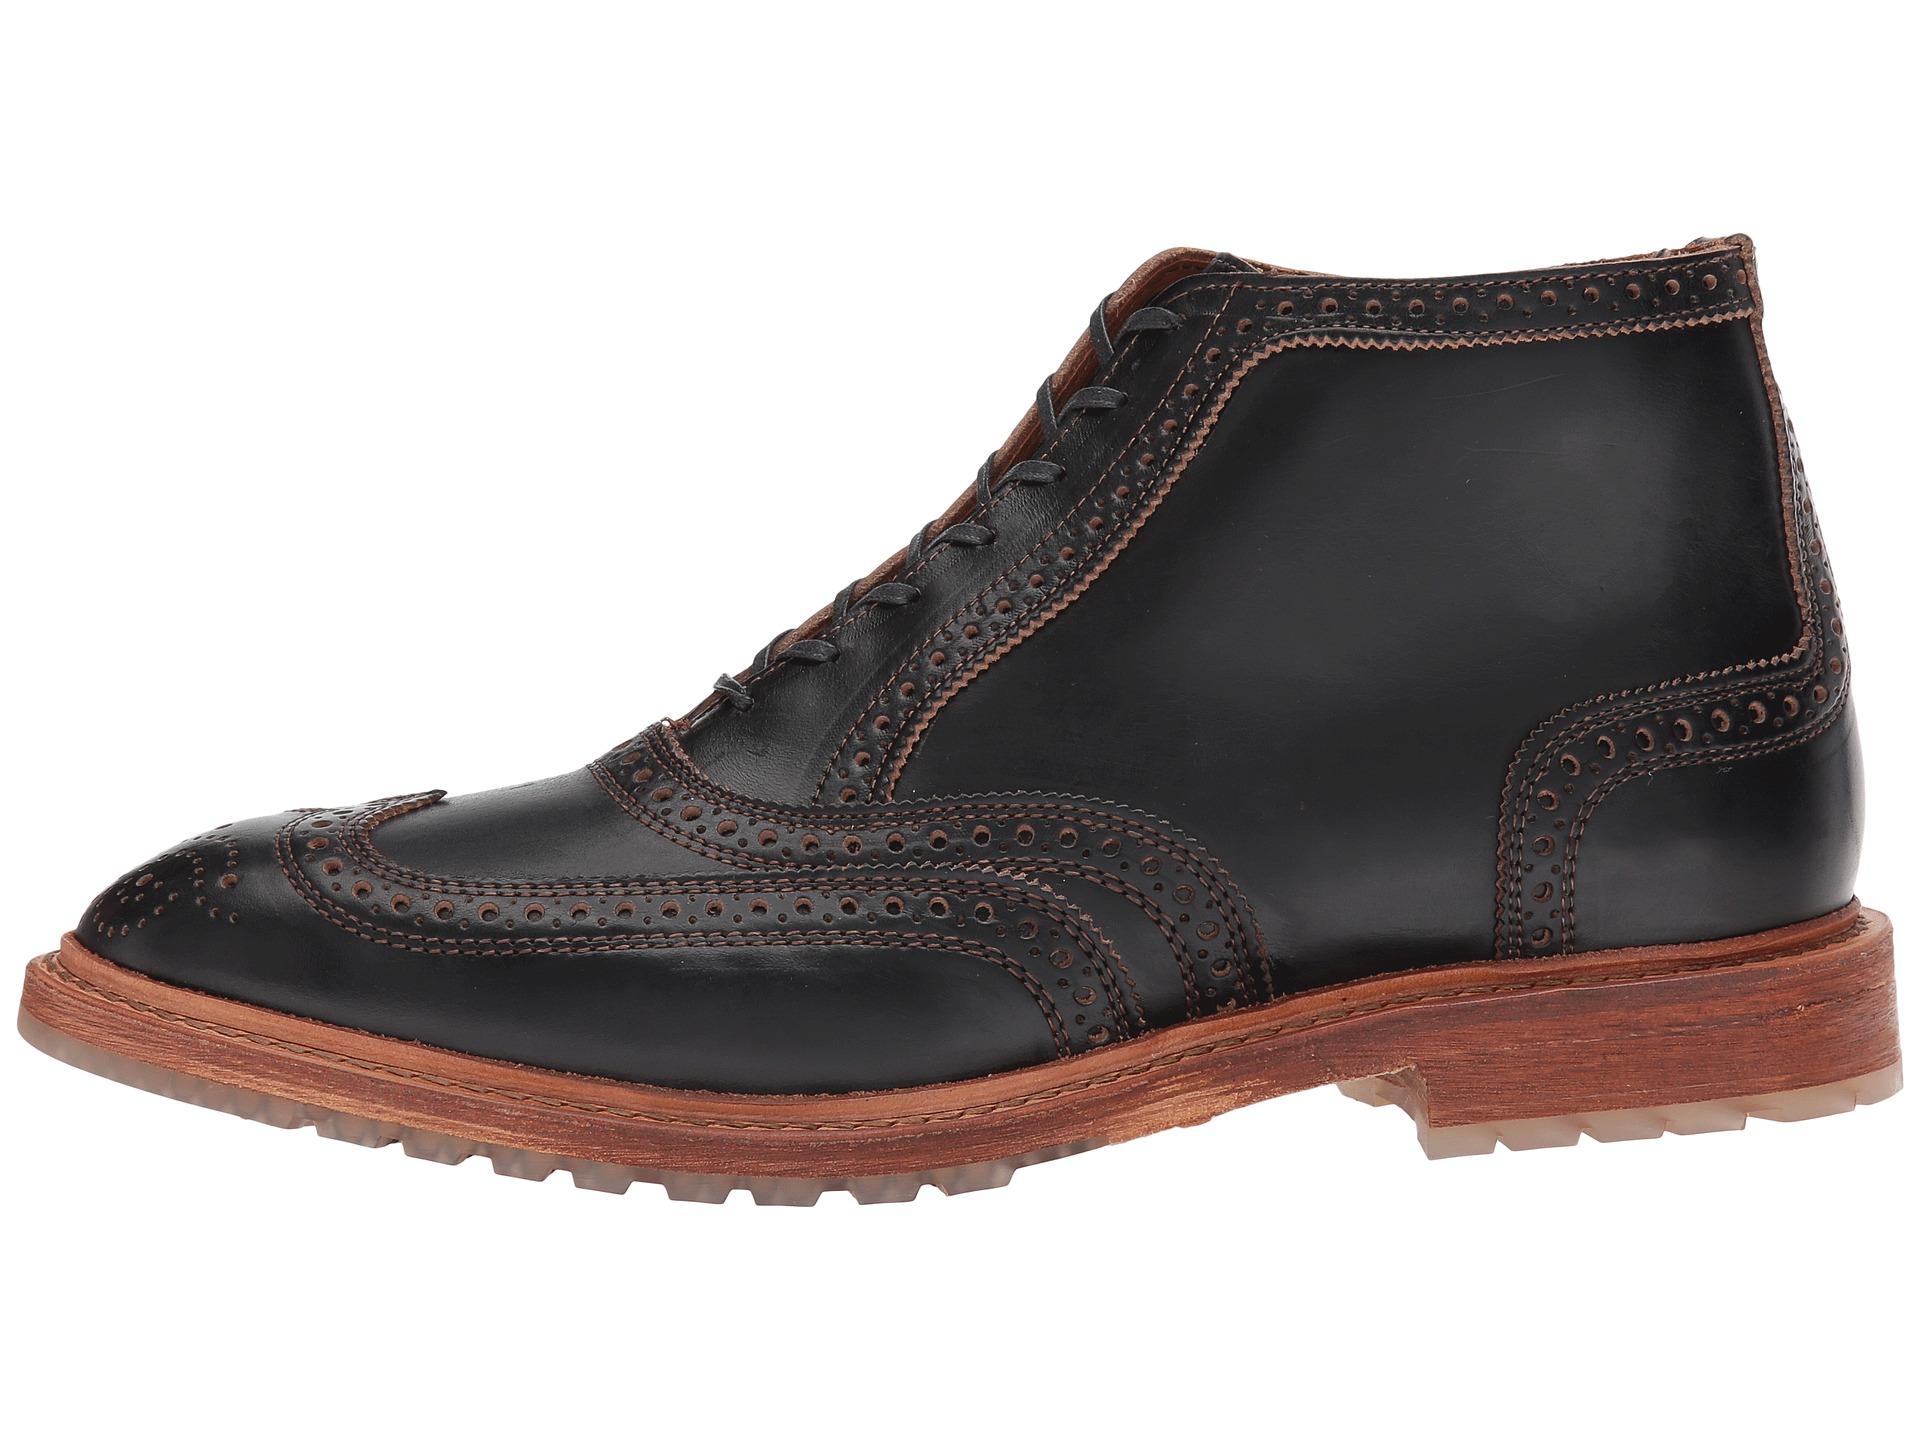 Clarks Shoes Stirling